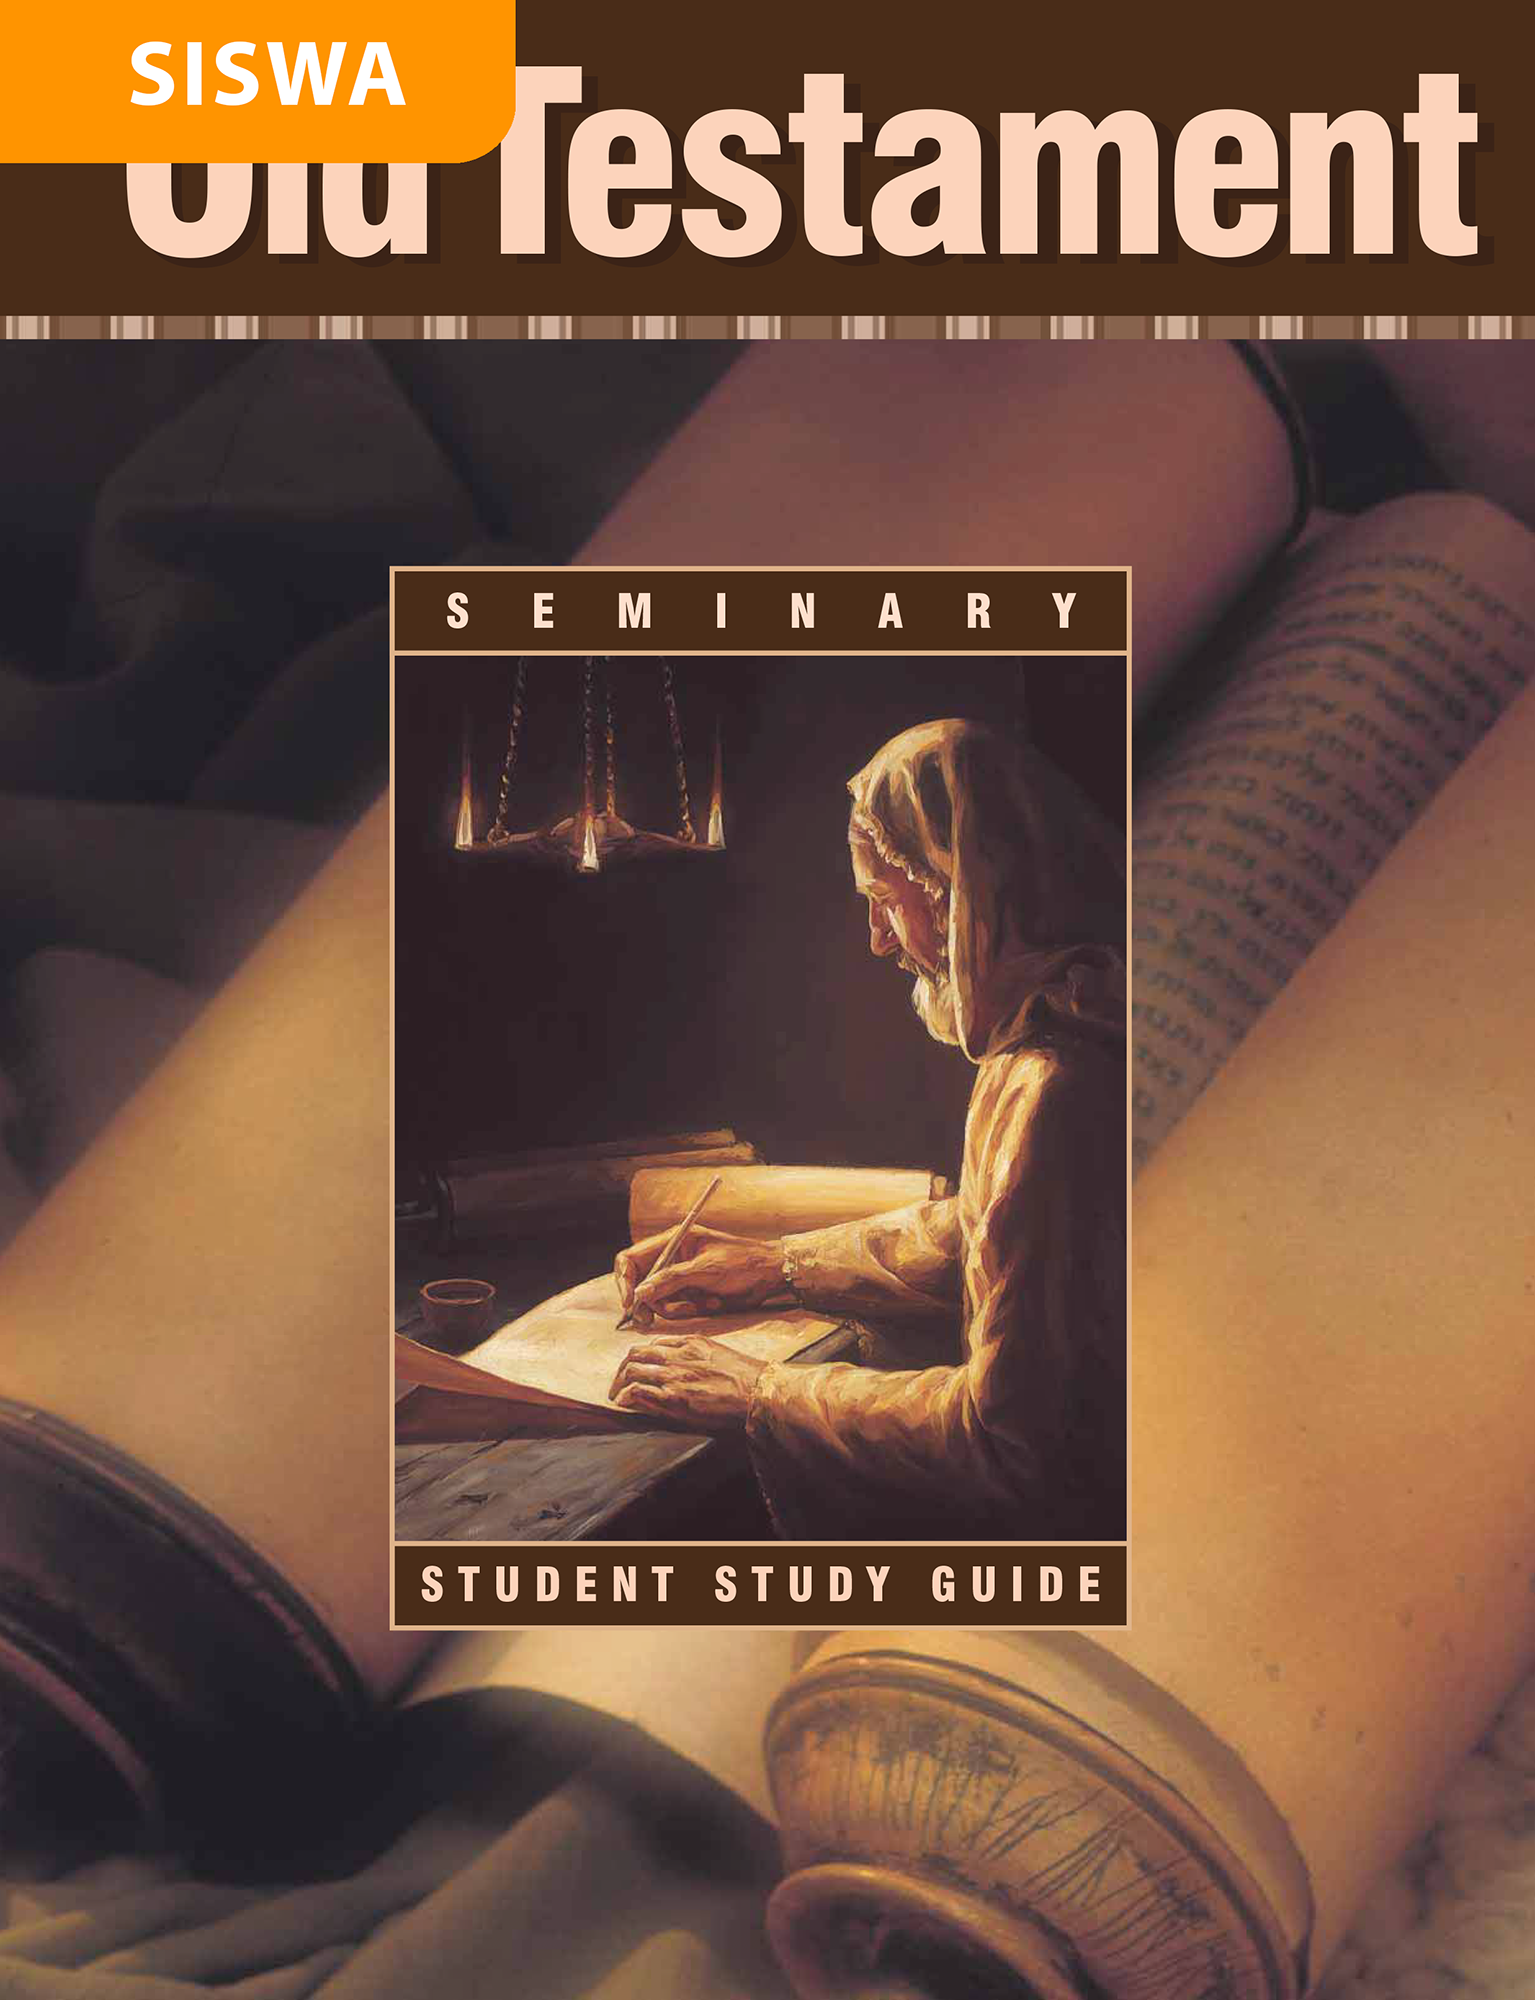 Penuntun Belajar Siswa Seminari Perjanjian Lama